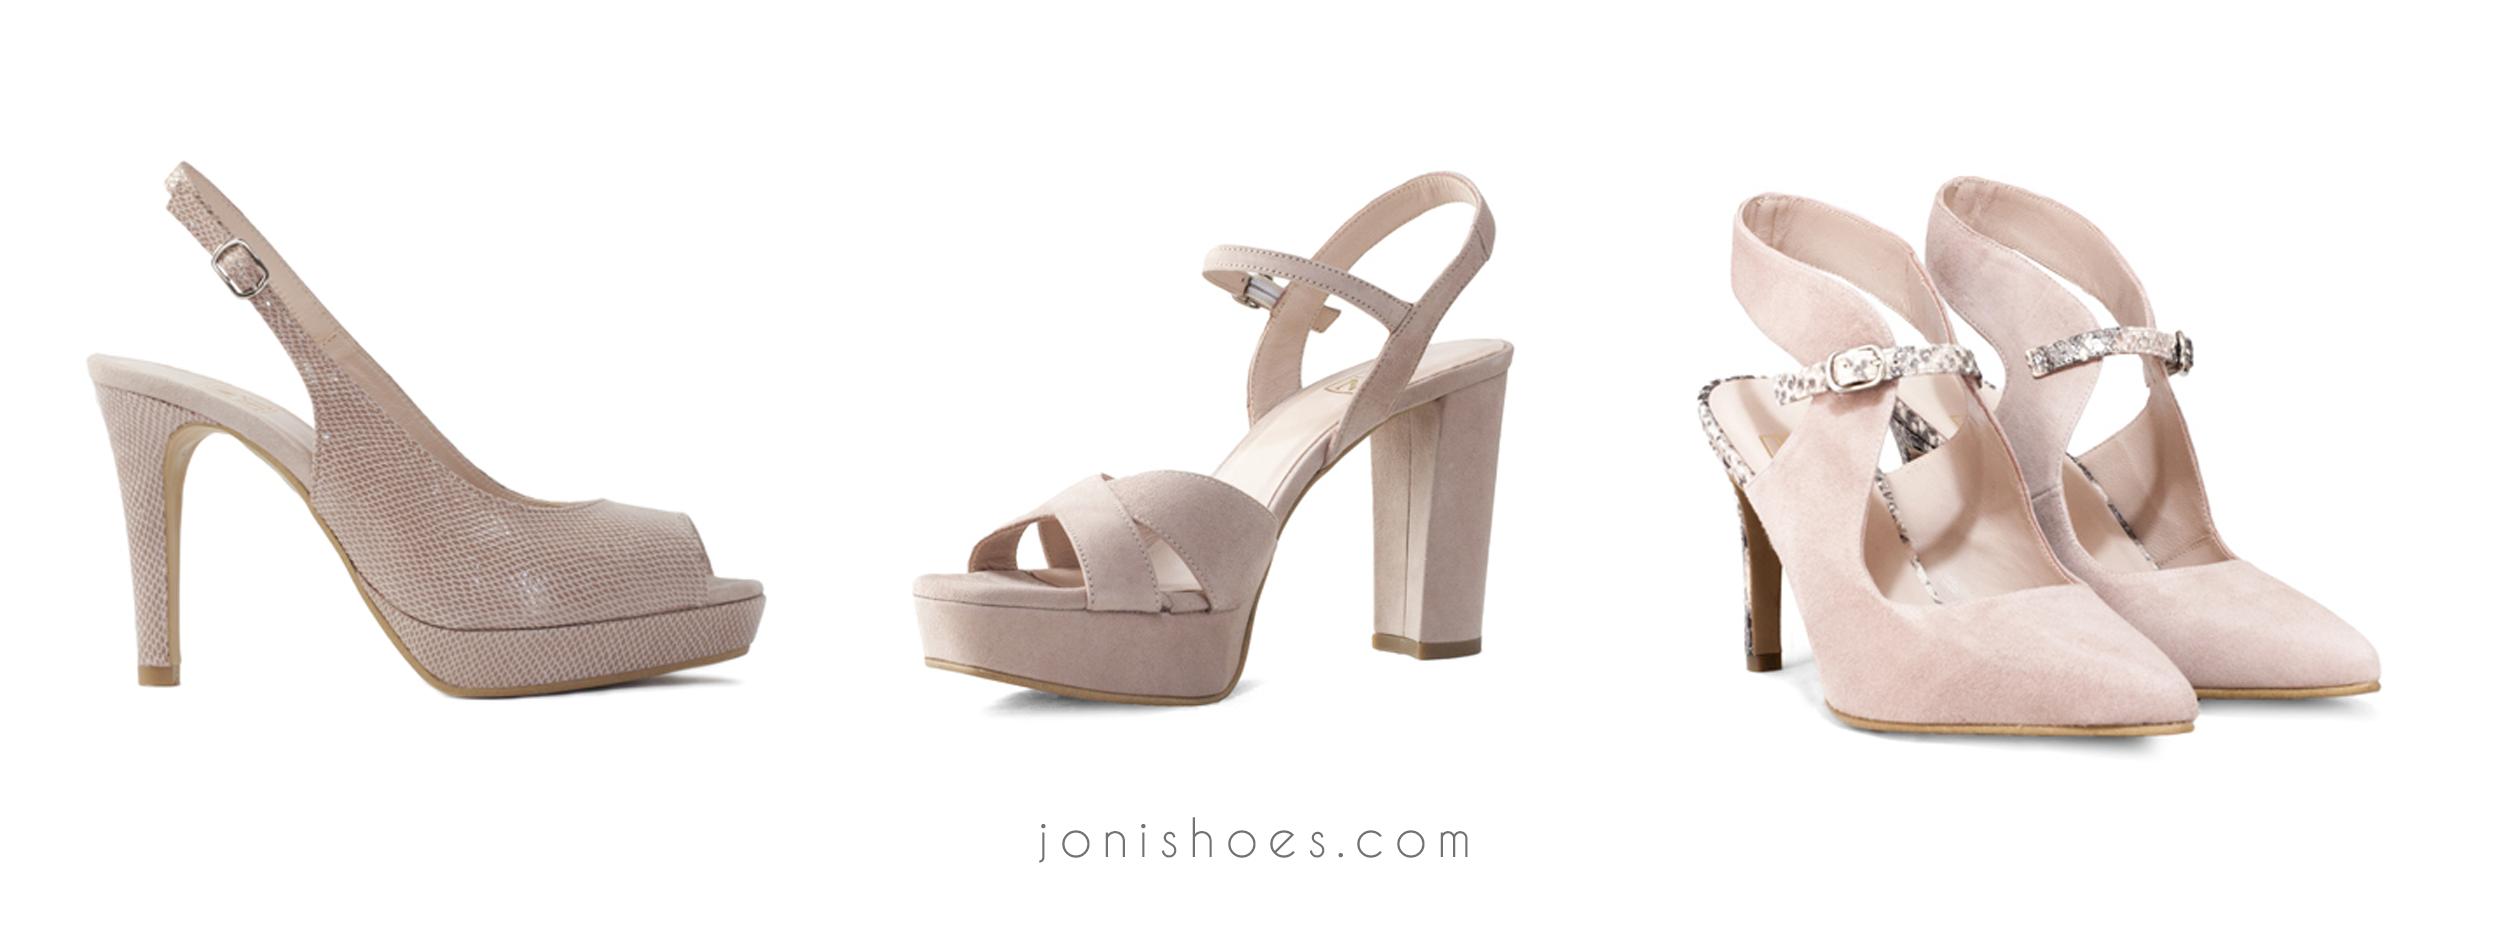 Joni Shoes Online